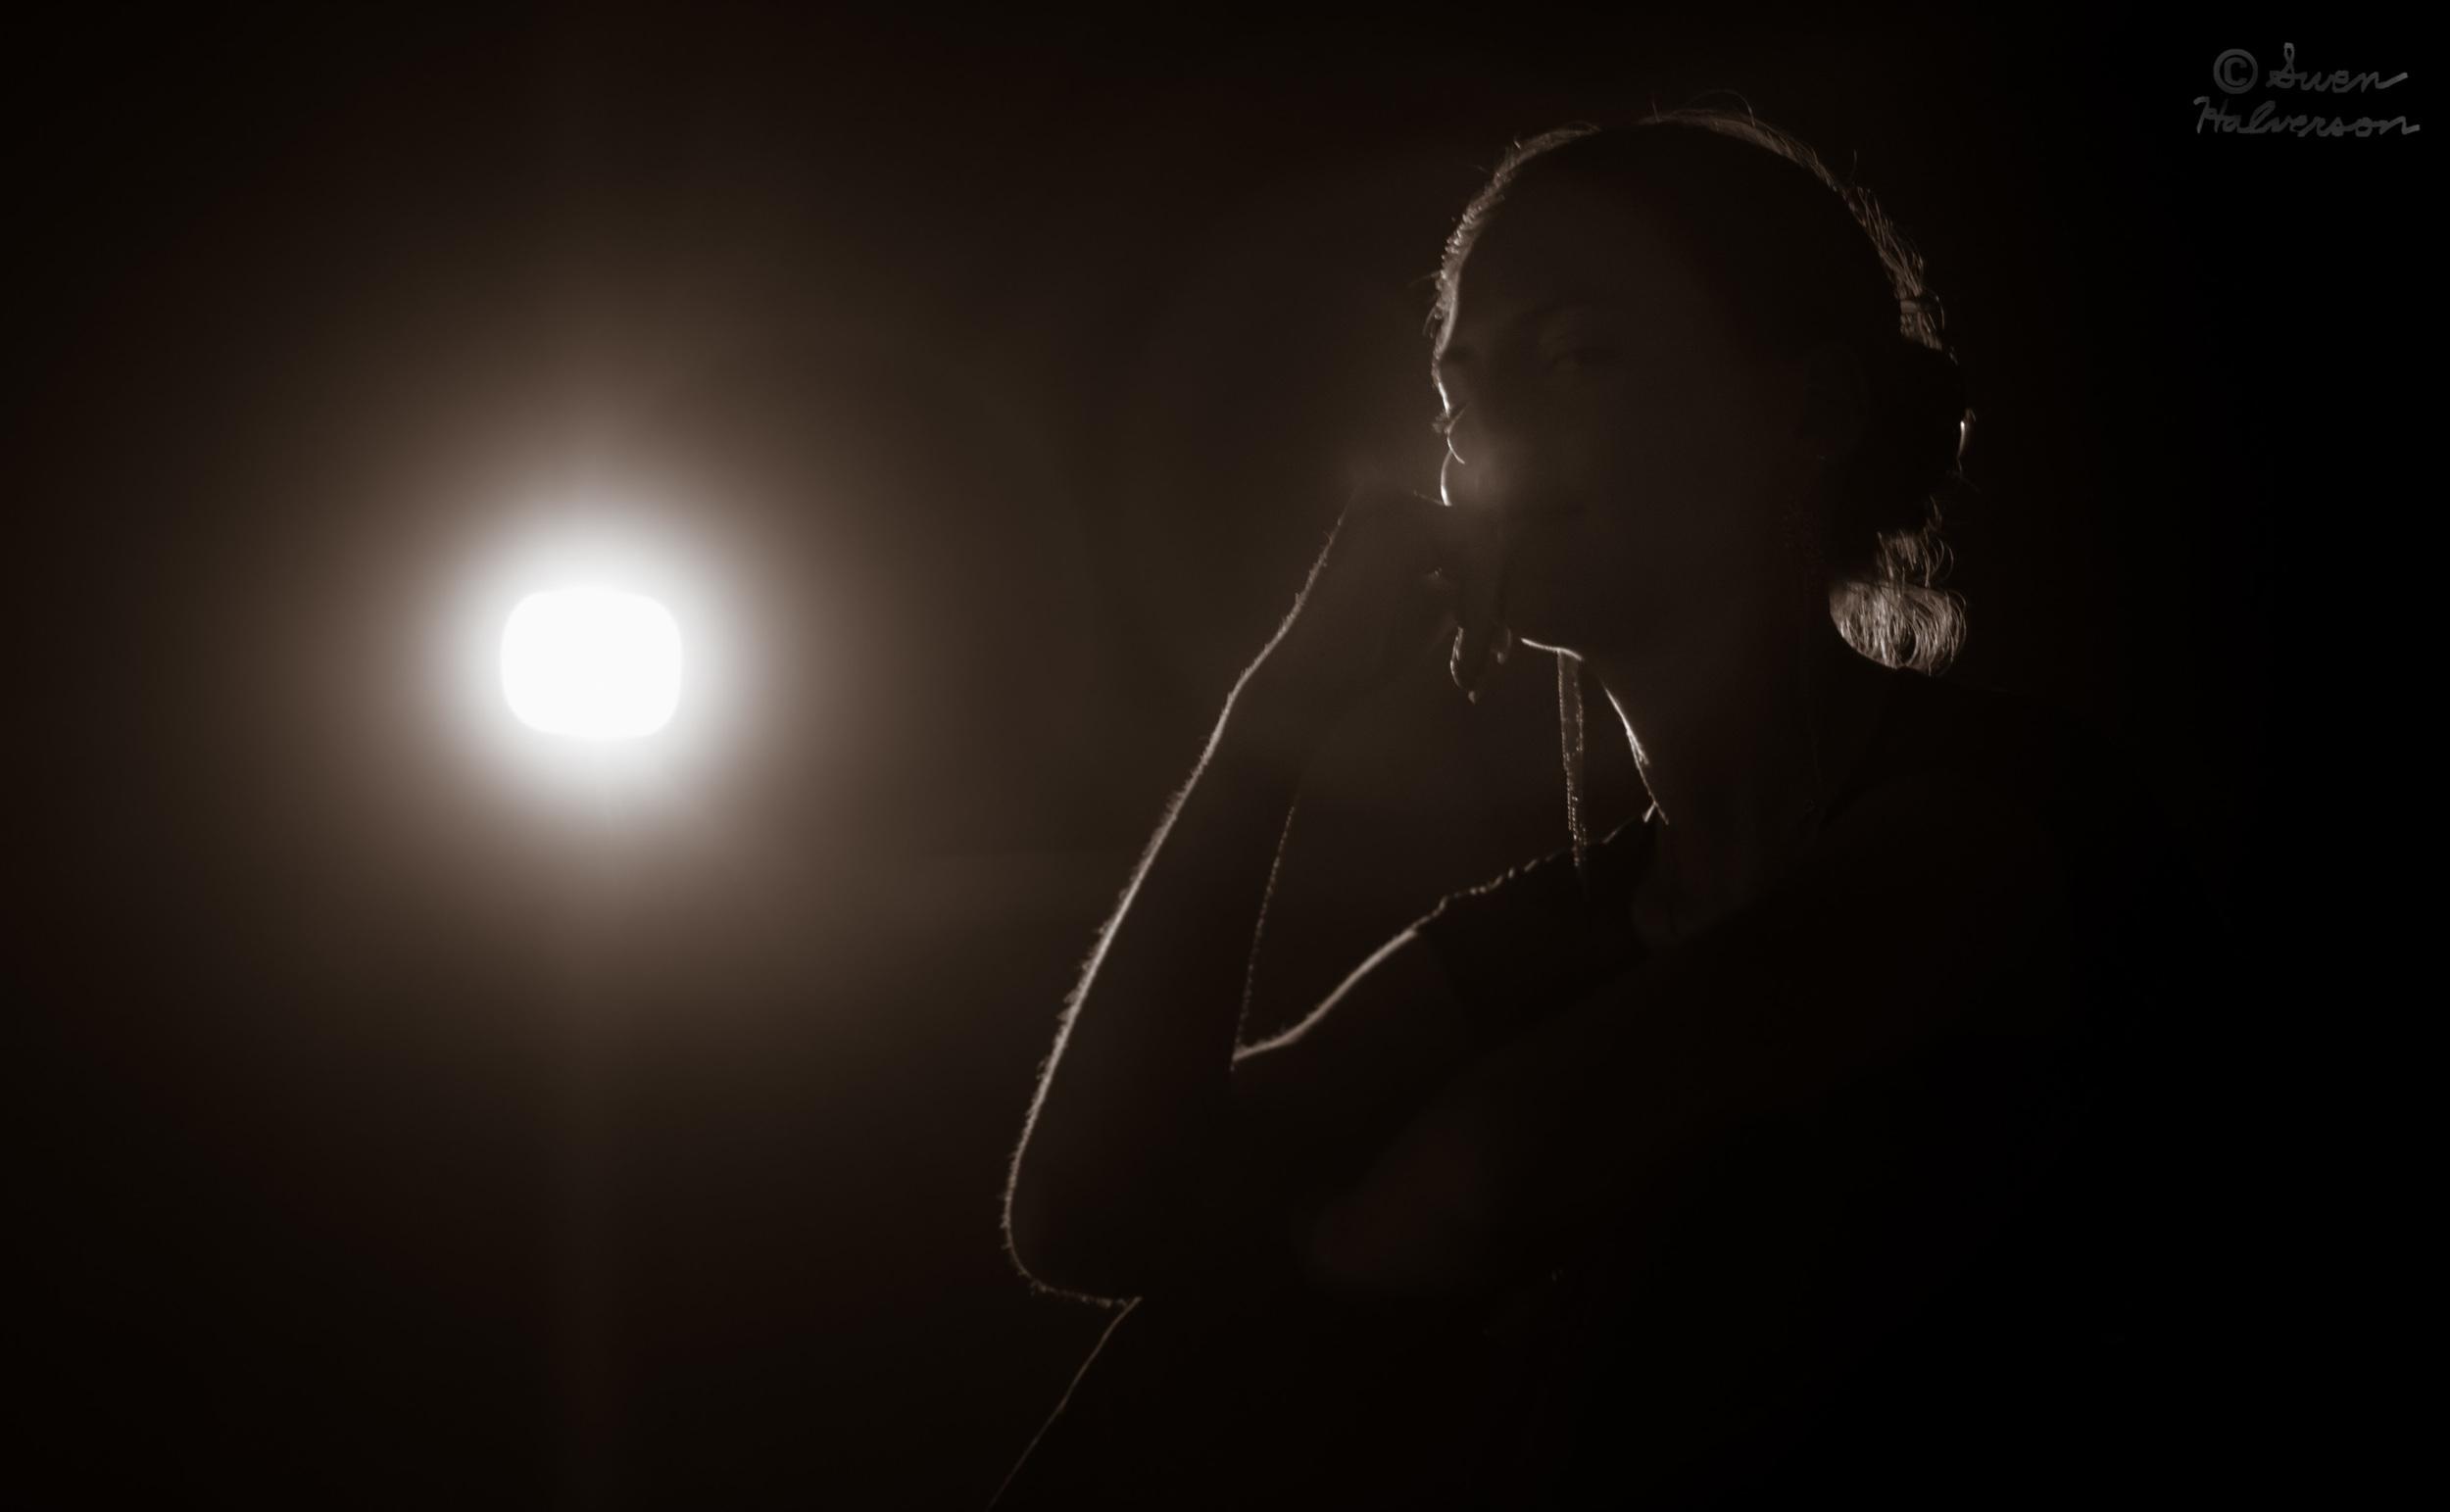 Theme: Light, Dark, Etc...